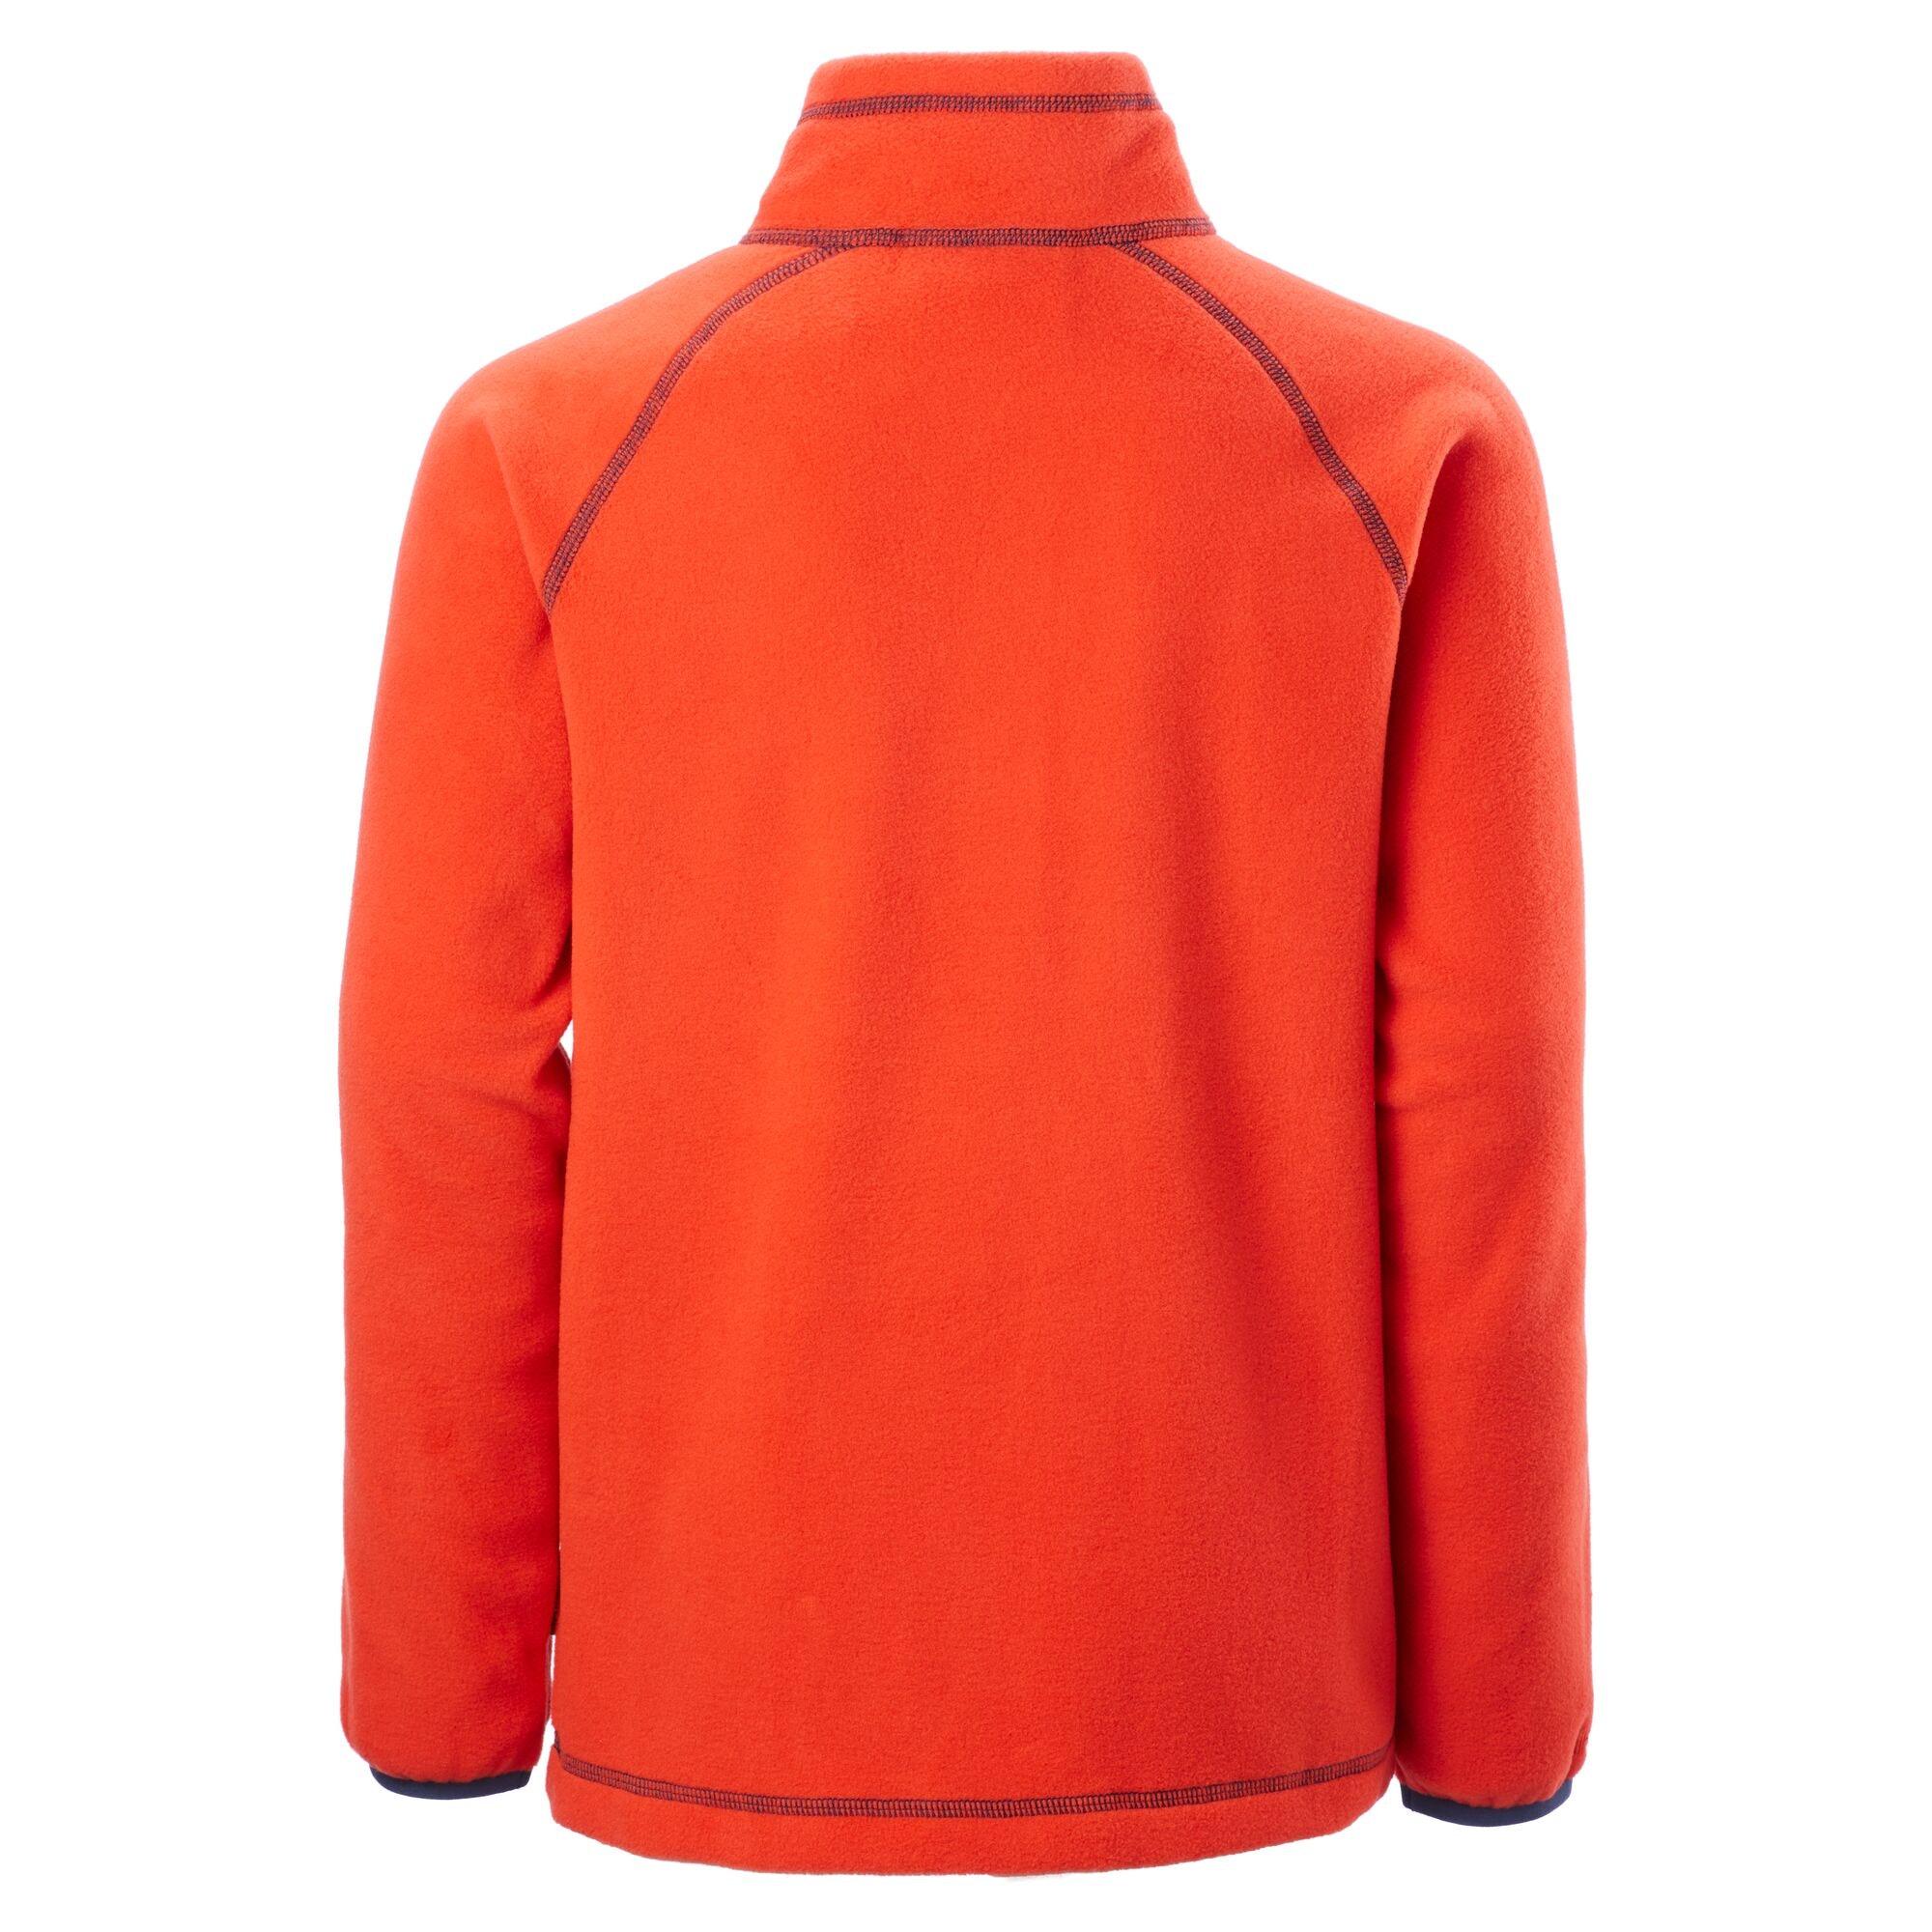 NEW-Kathmandu-Ridge-Kids-039-Girls-039-Boys-039-Warm-Fleece-Jacket-1-4-Zip-Pullover-Top thumbnail 30